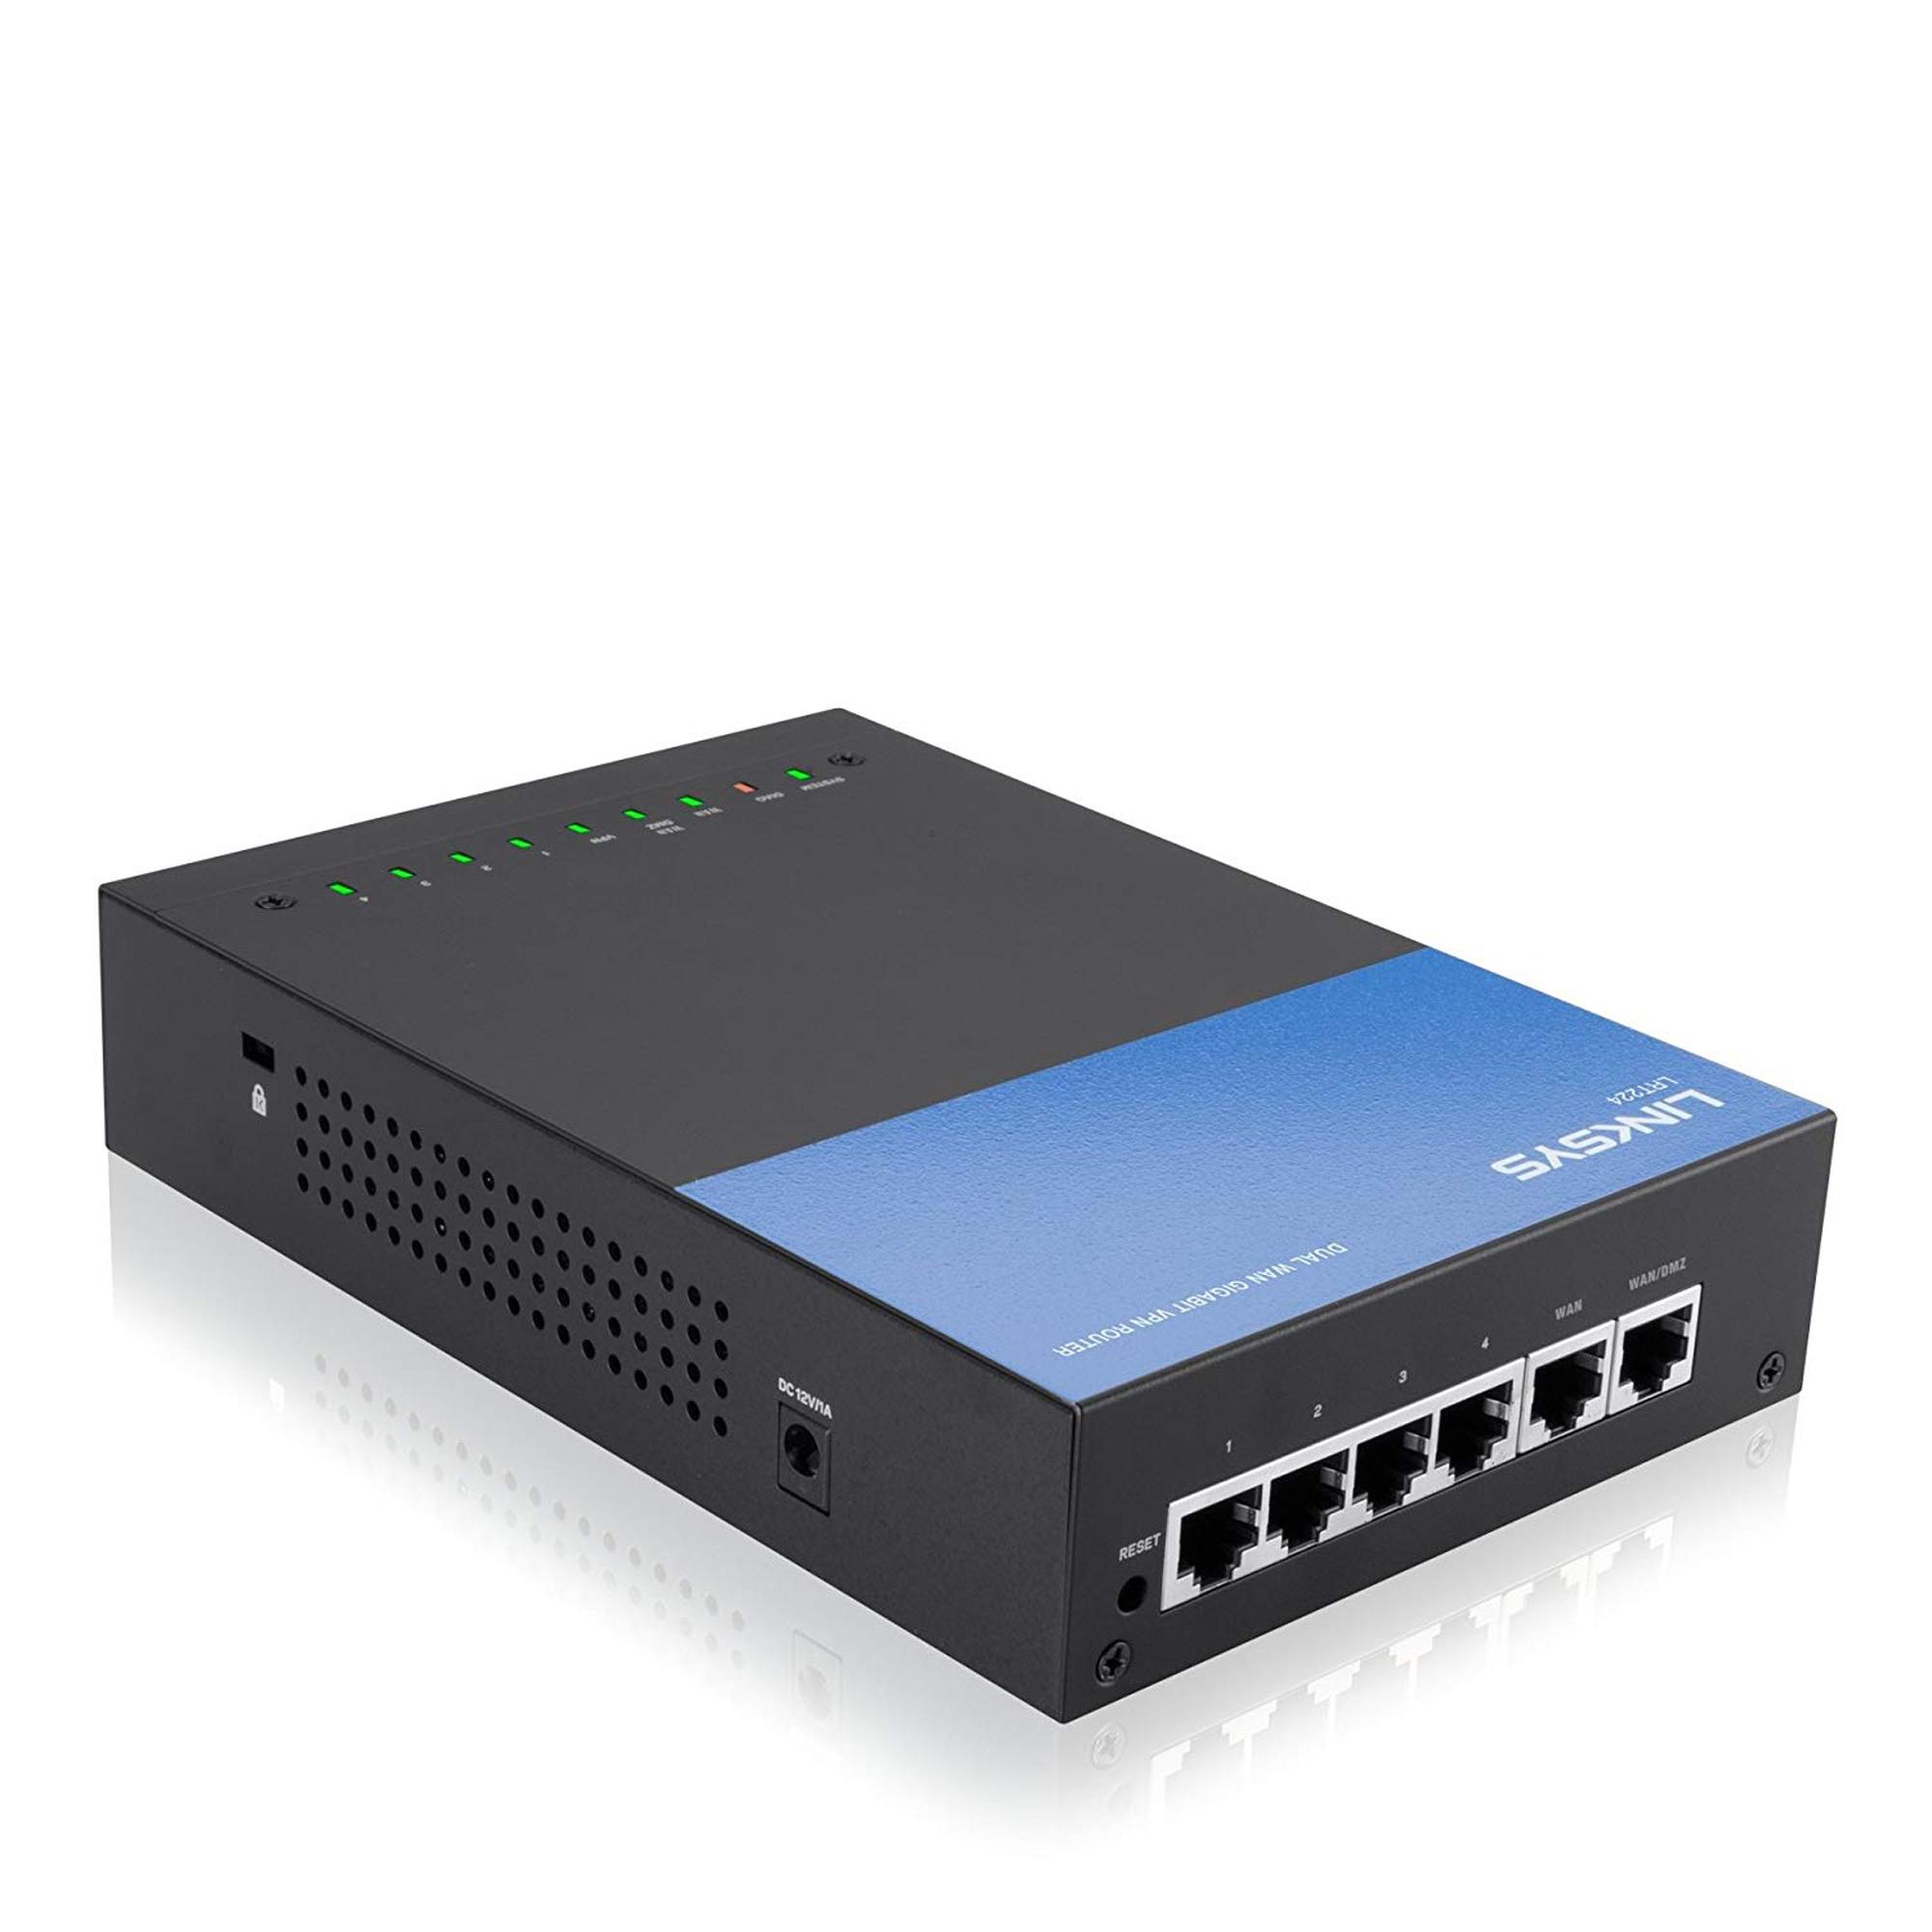 Linksys LRT224 Dual WAN Business Gigabit VPN Router